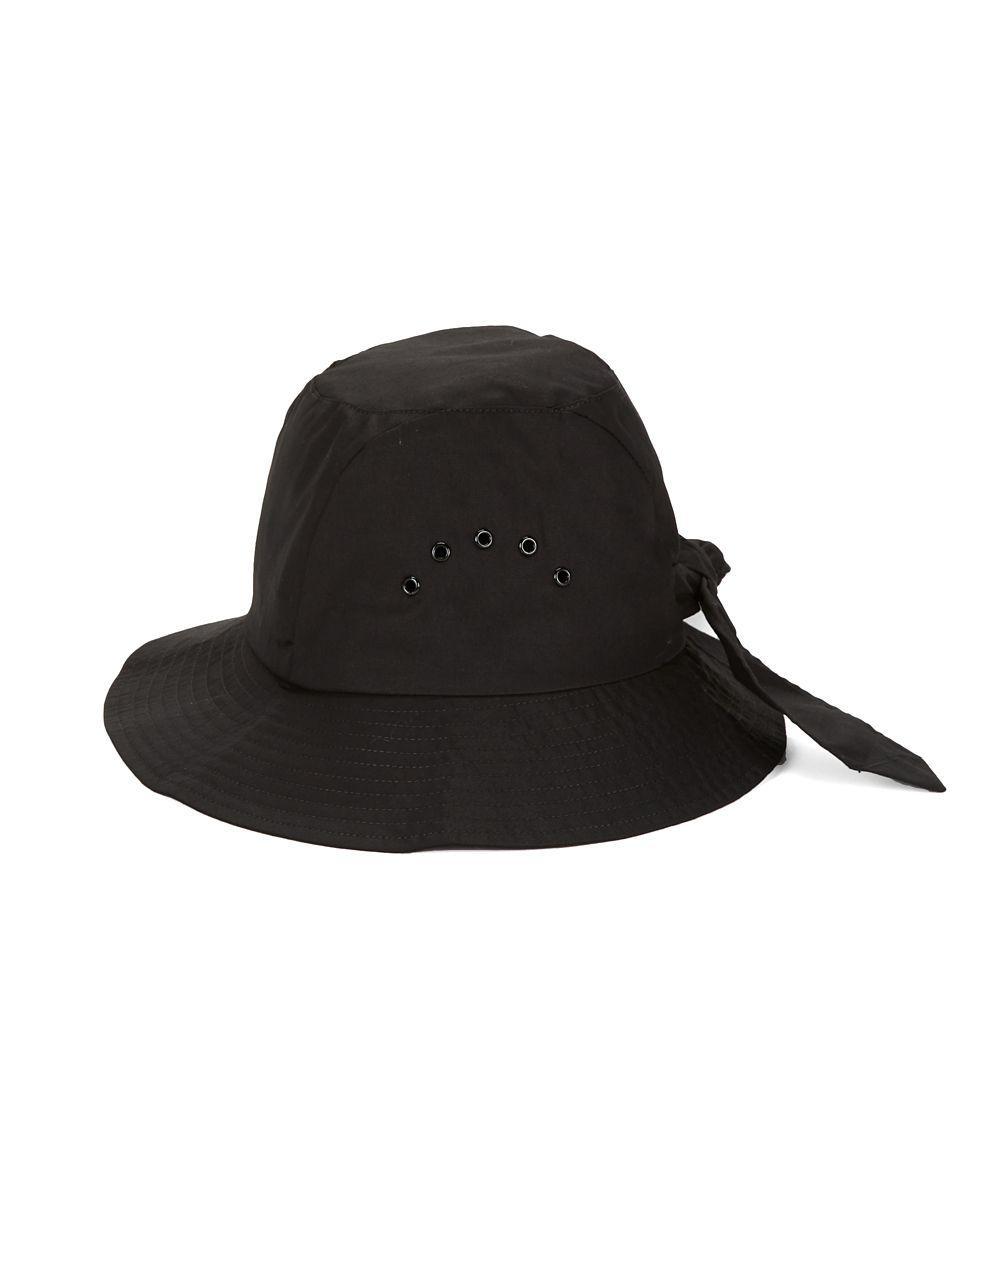 174e7d92fe5 Betmar Cotton Cloche Knot Hat in Black - Lyst